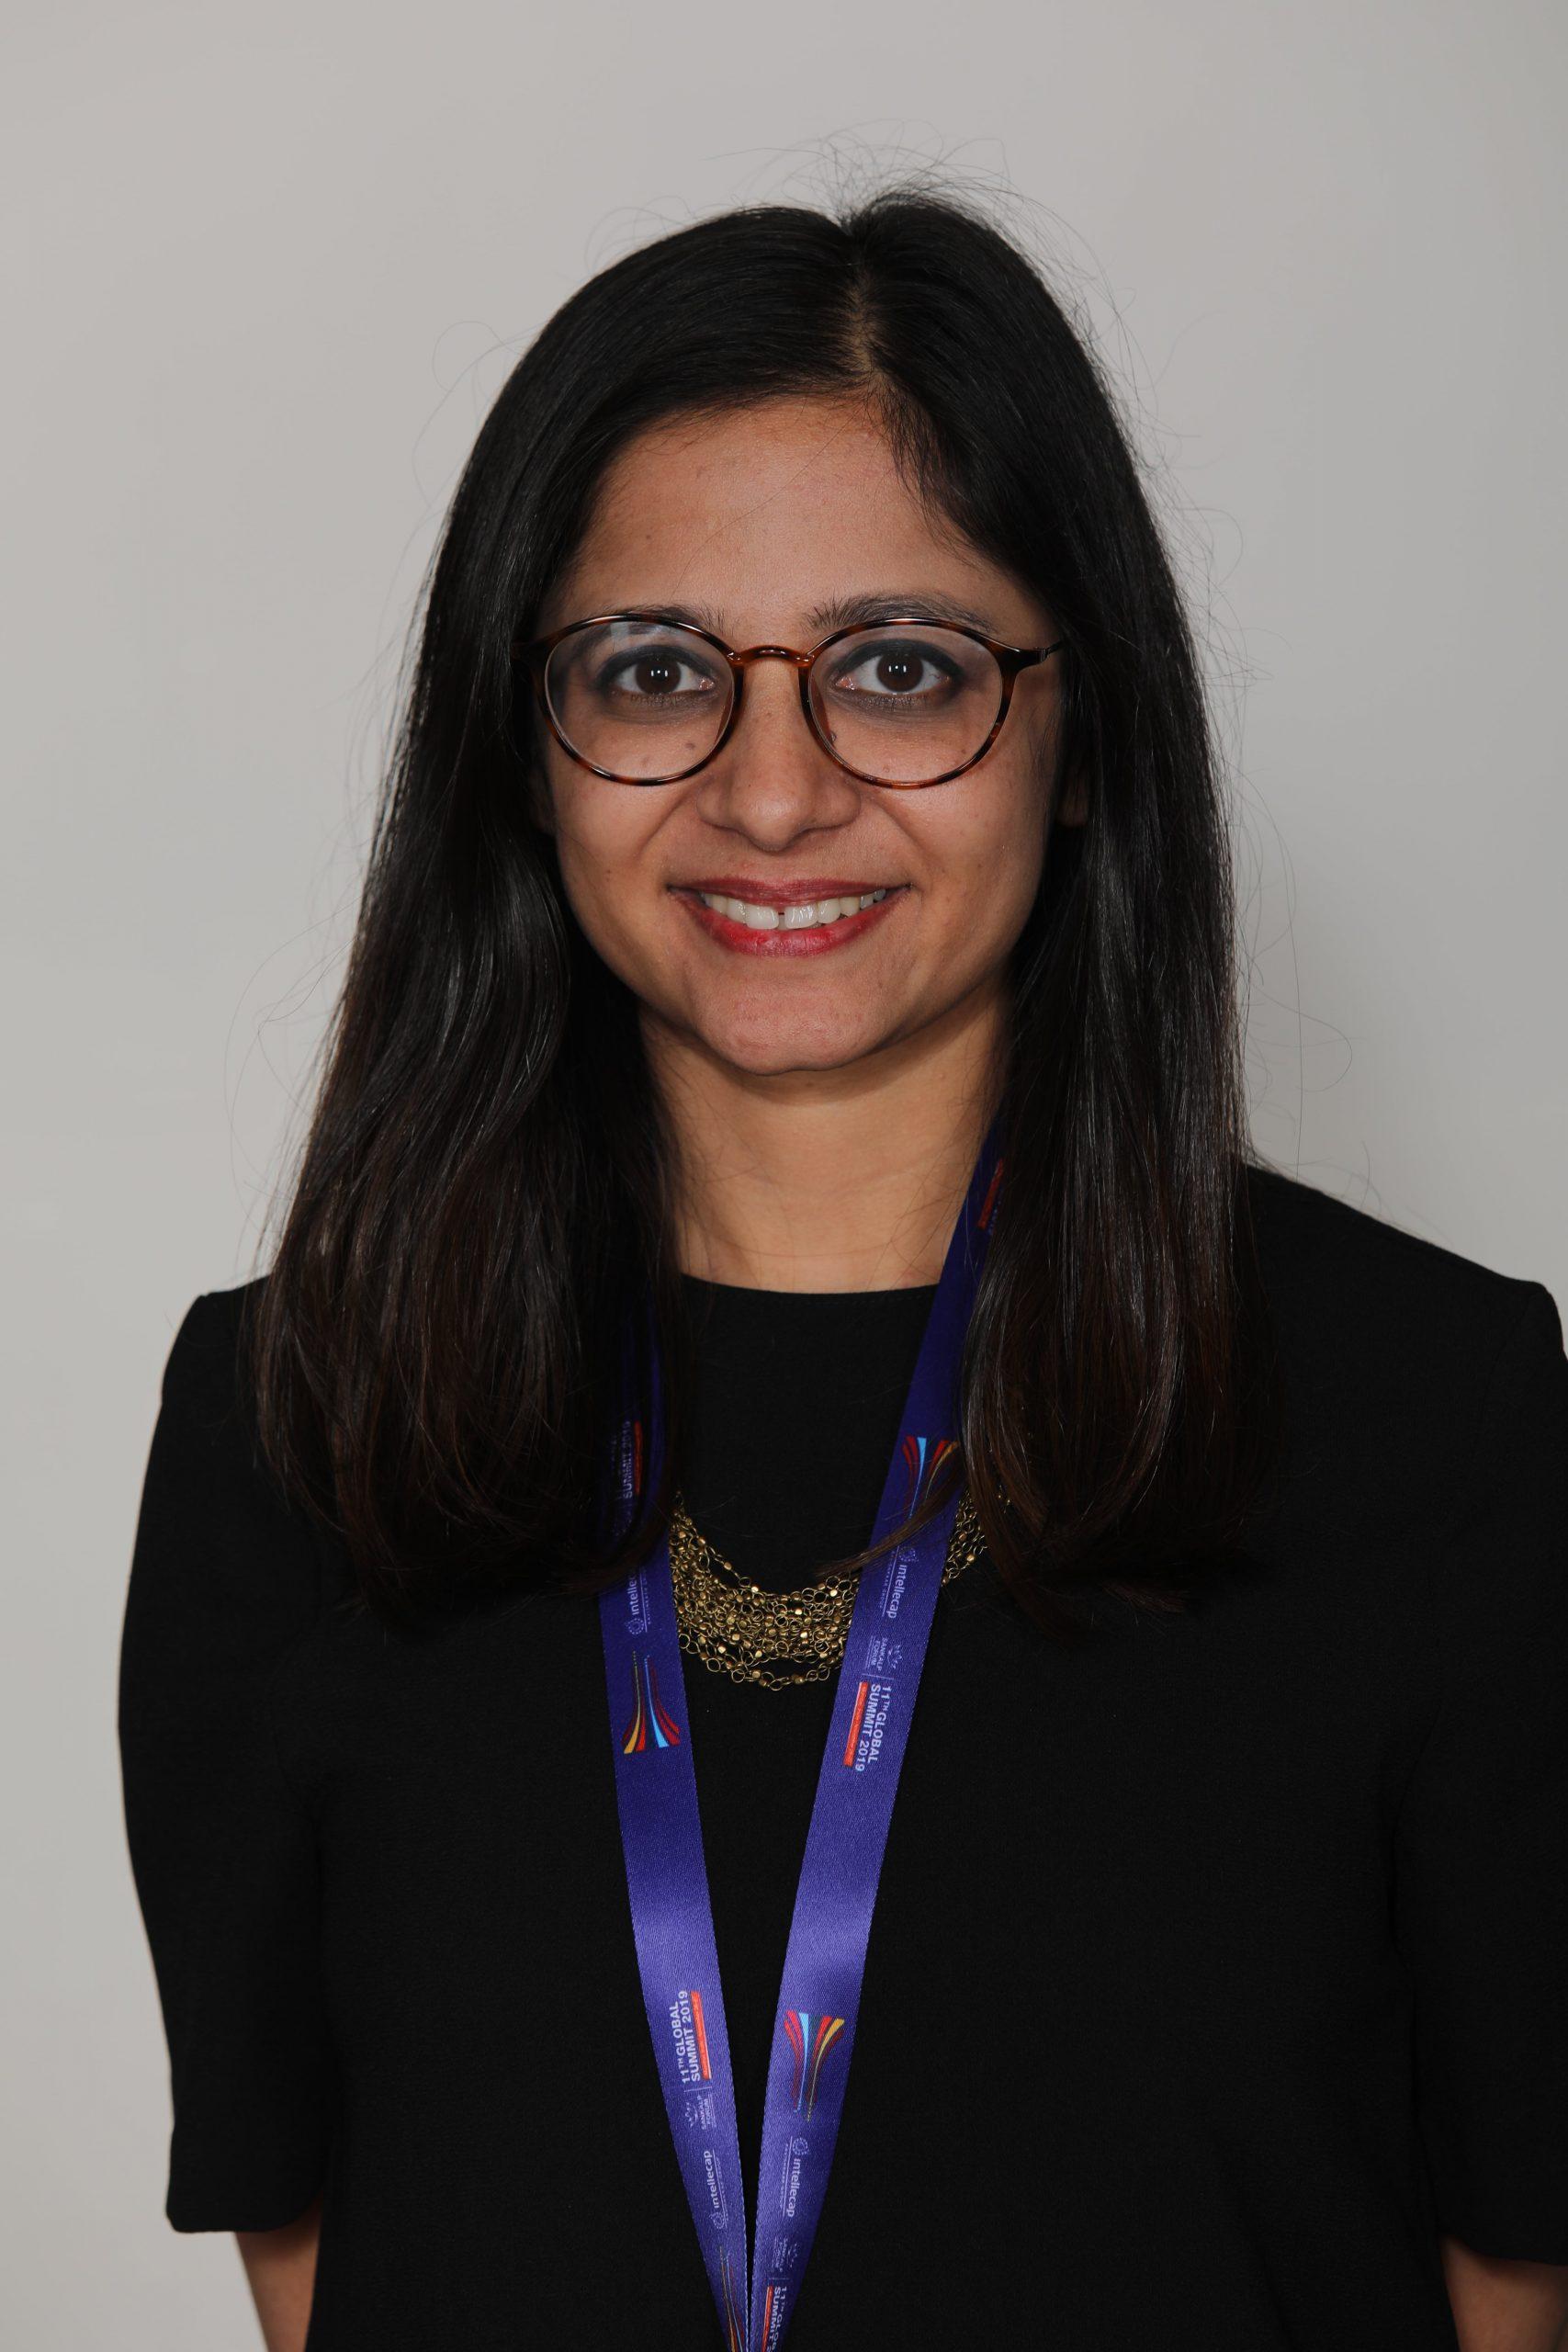 Divya Gupta